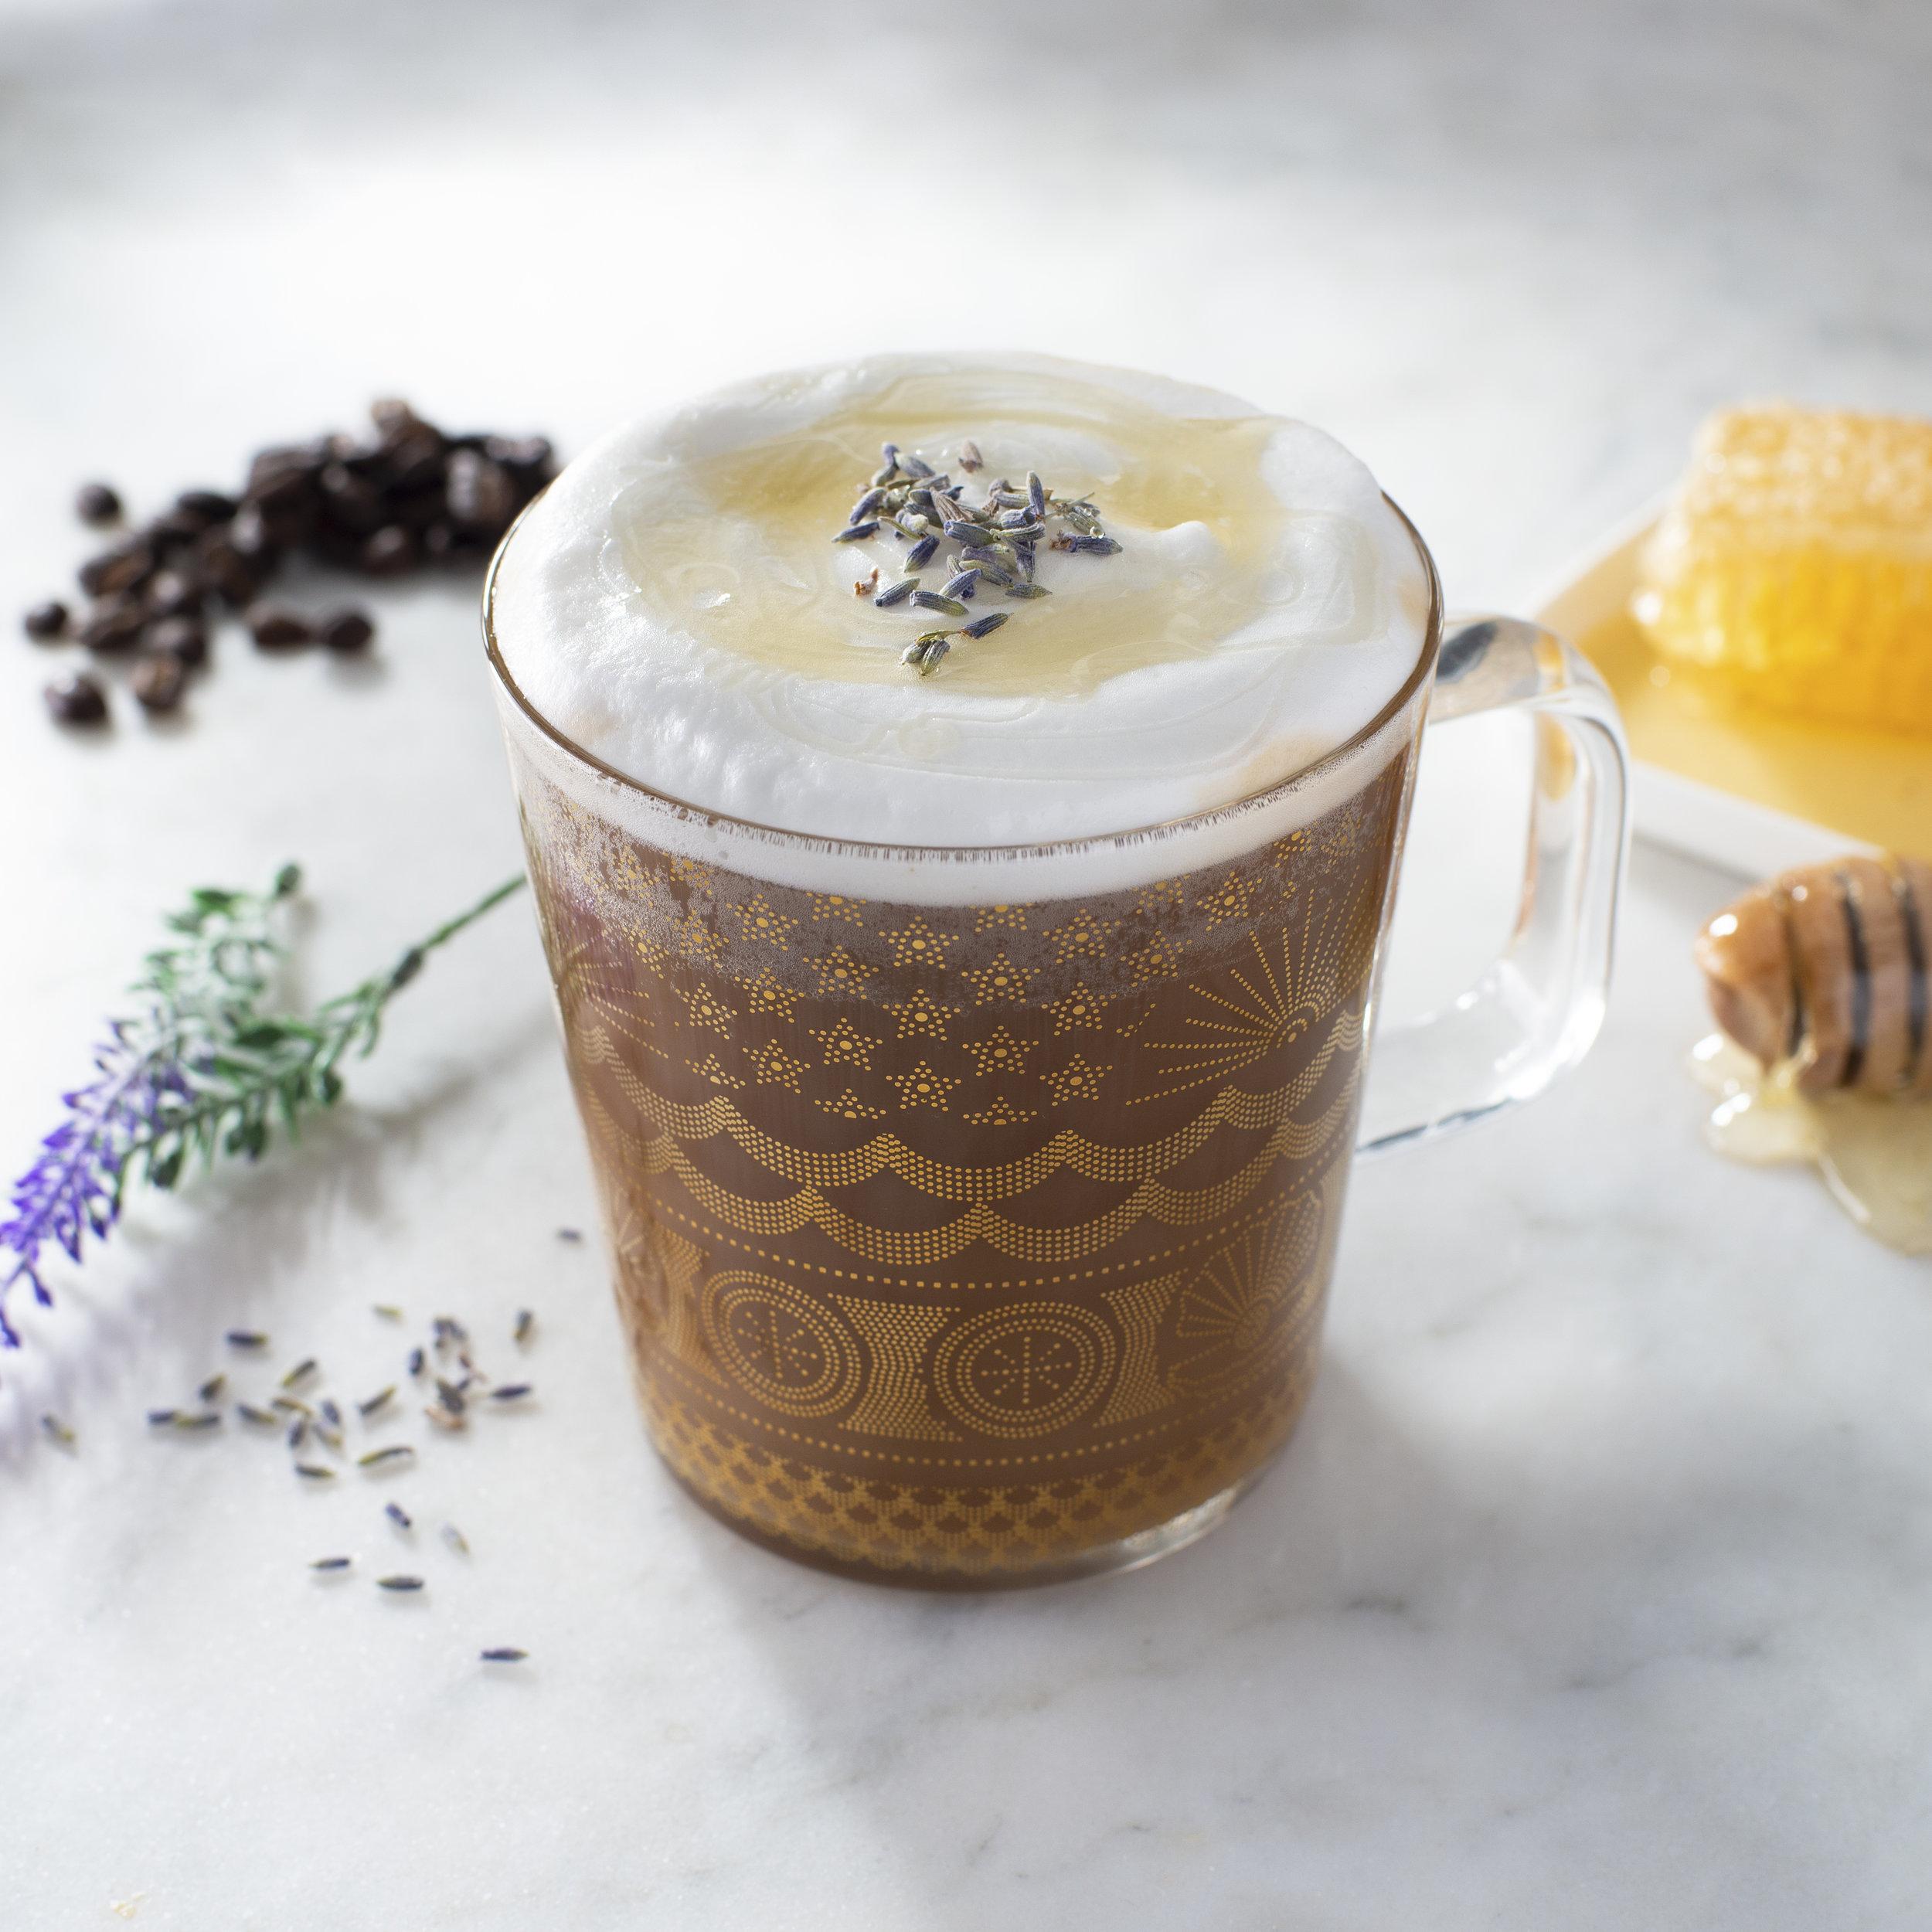 Honey and Lavender Latte